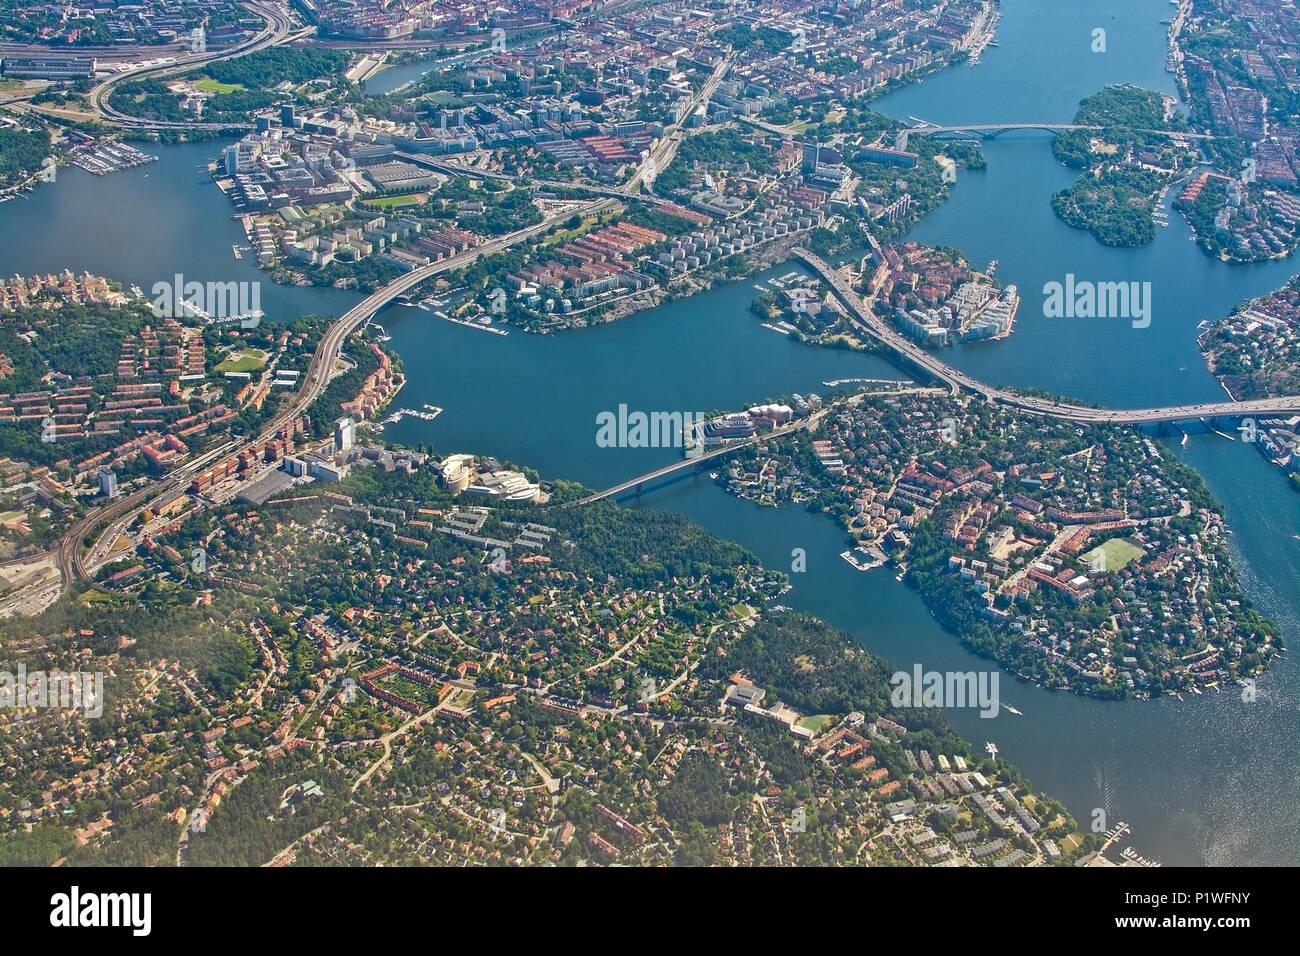 STOCKHOLM, SWEDEN - JUNE 1, 2018: Aerial shot over Stockholm, Essingeleden and Traneberg bridge to Bromma, during inflight to Arlanda airport on a sun Stock Photo